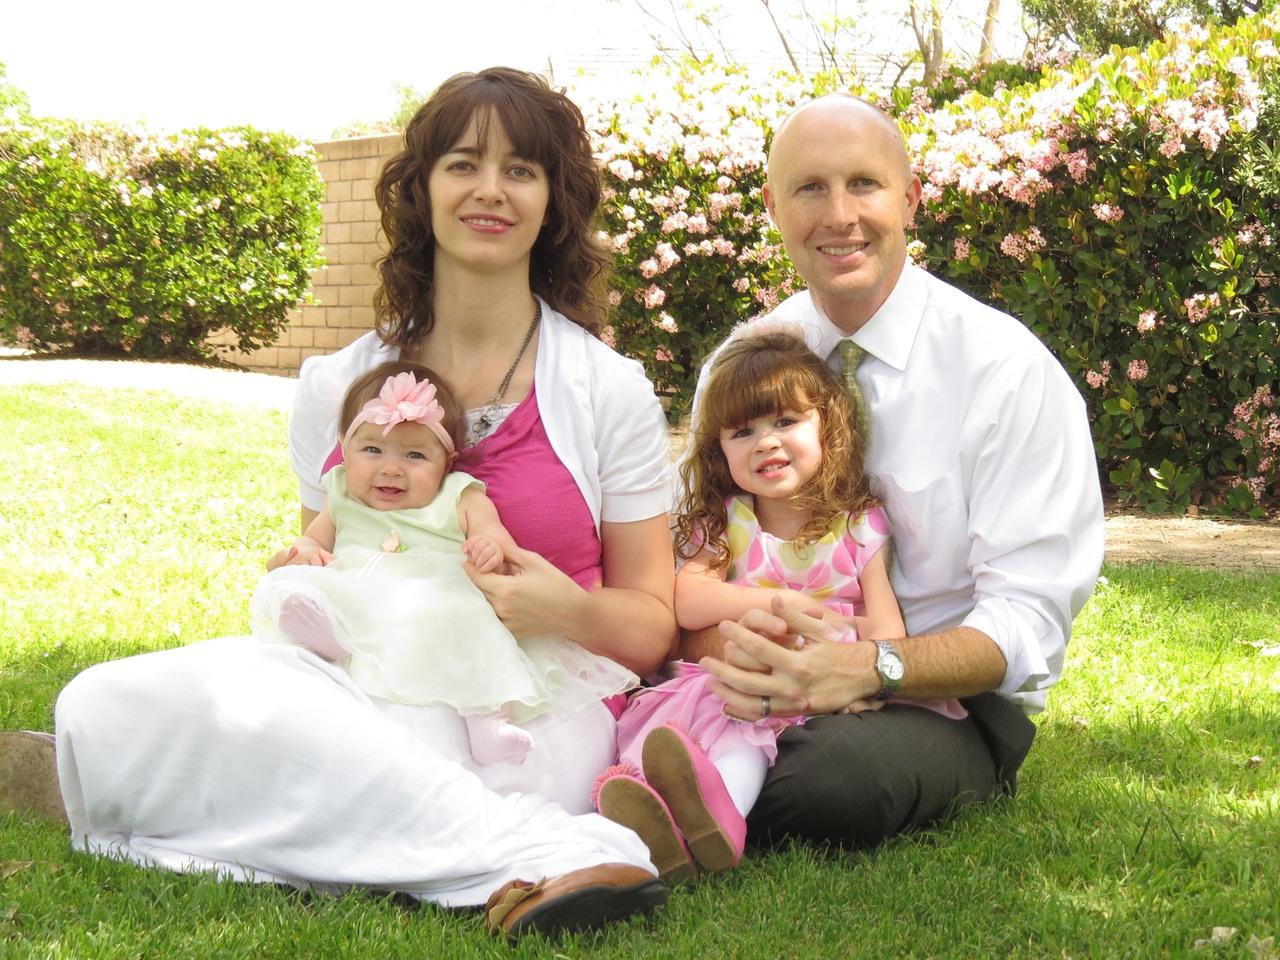 Pastor John and Sarah Ashley